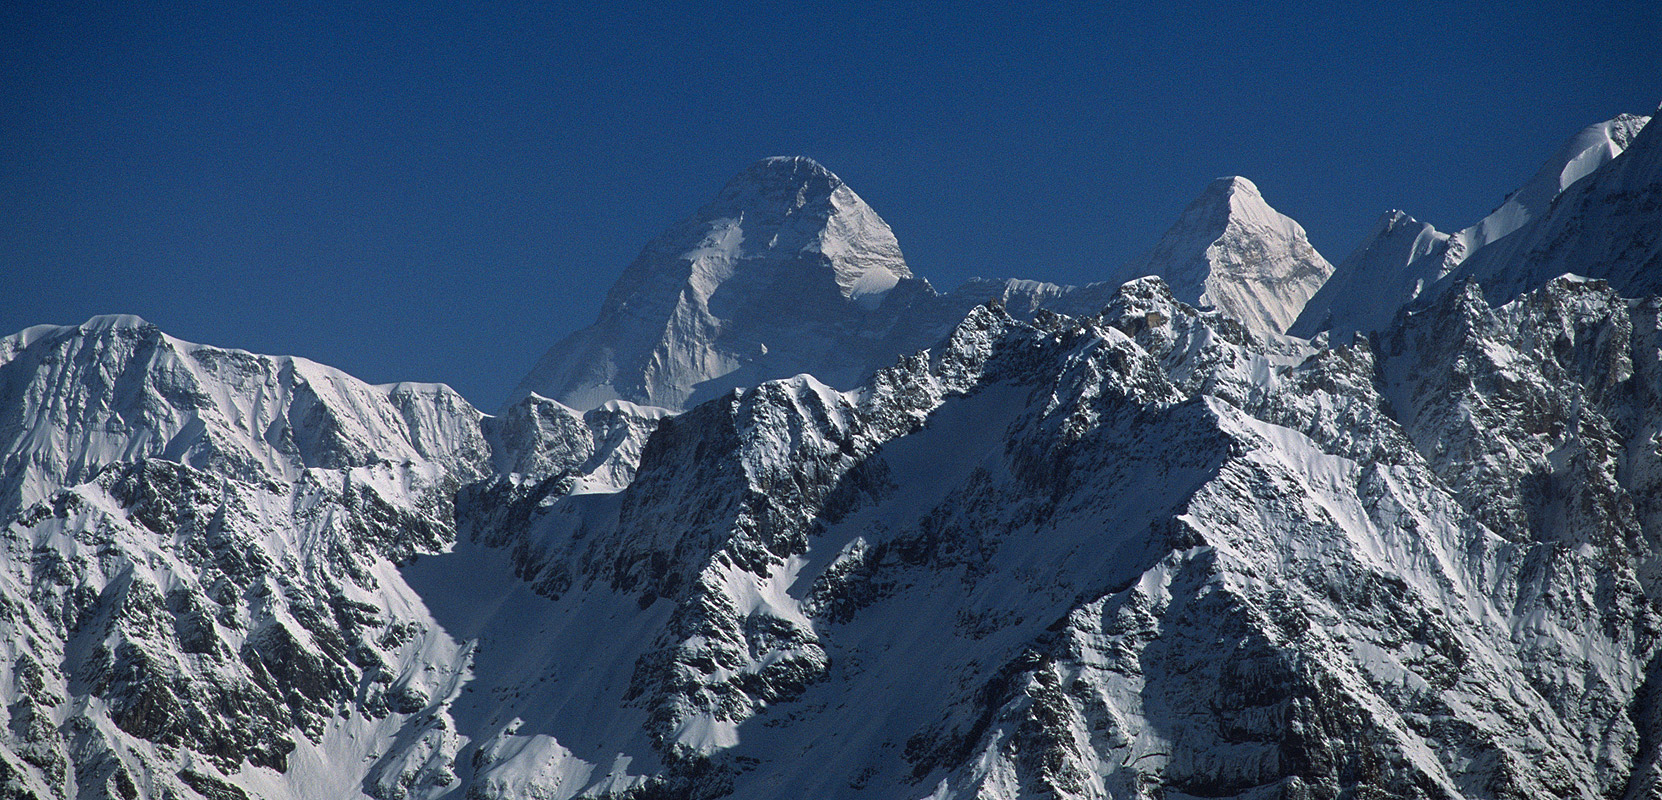 The summits of Nanda Devi (7816m) and Nanda Devi East (7434m) from near Kalgudi Bhel KhalNikon F90X, 180mm, Fuji Velvia